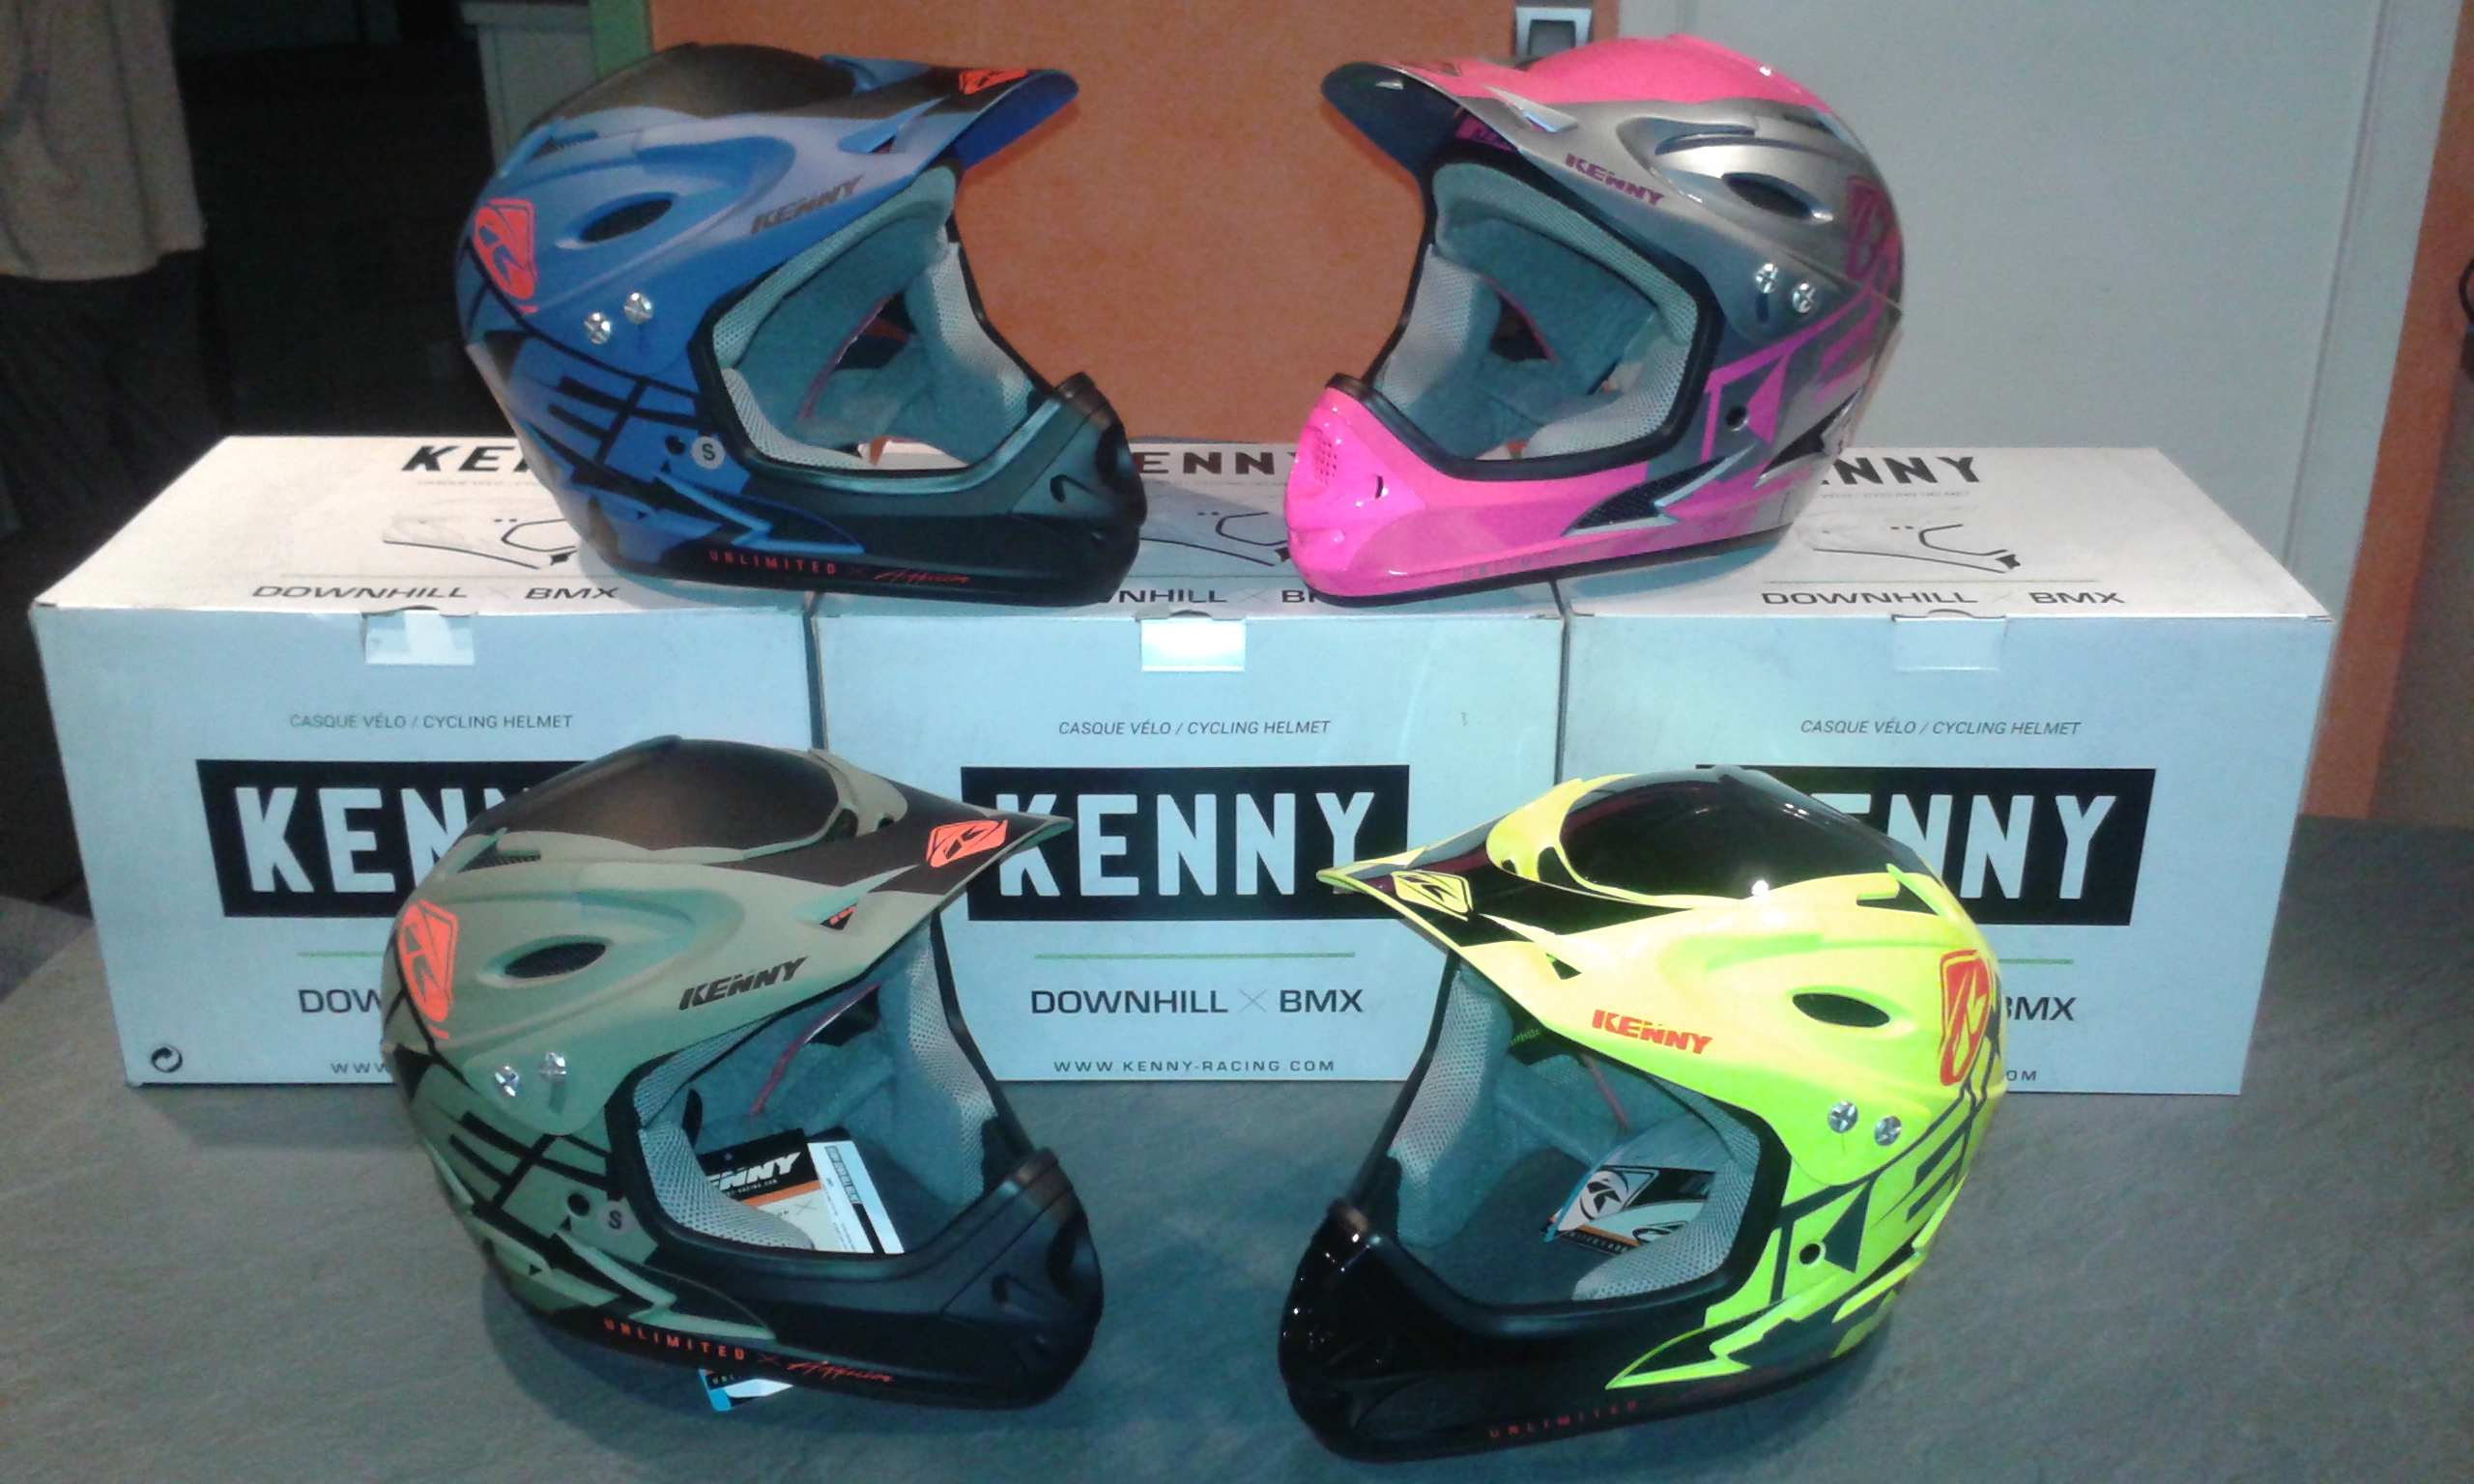 casque kenny bmx - DH  89€00